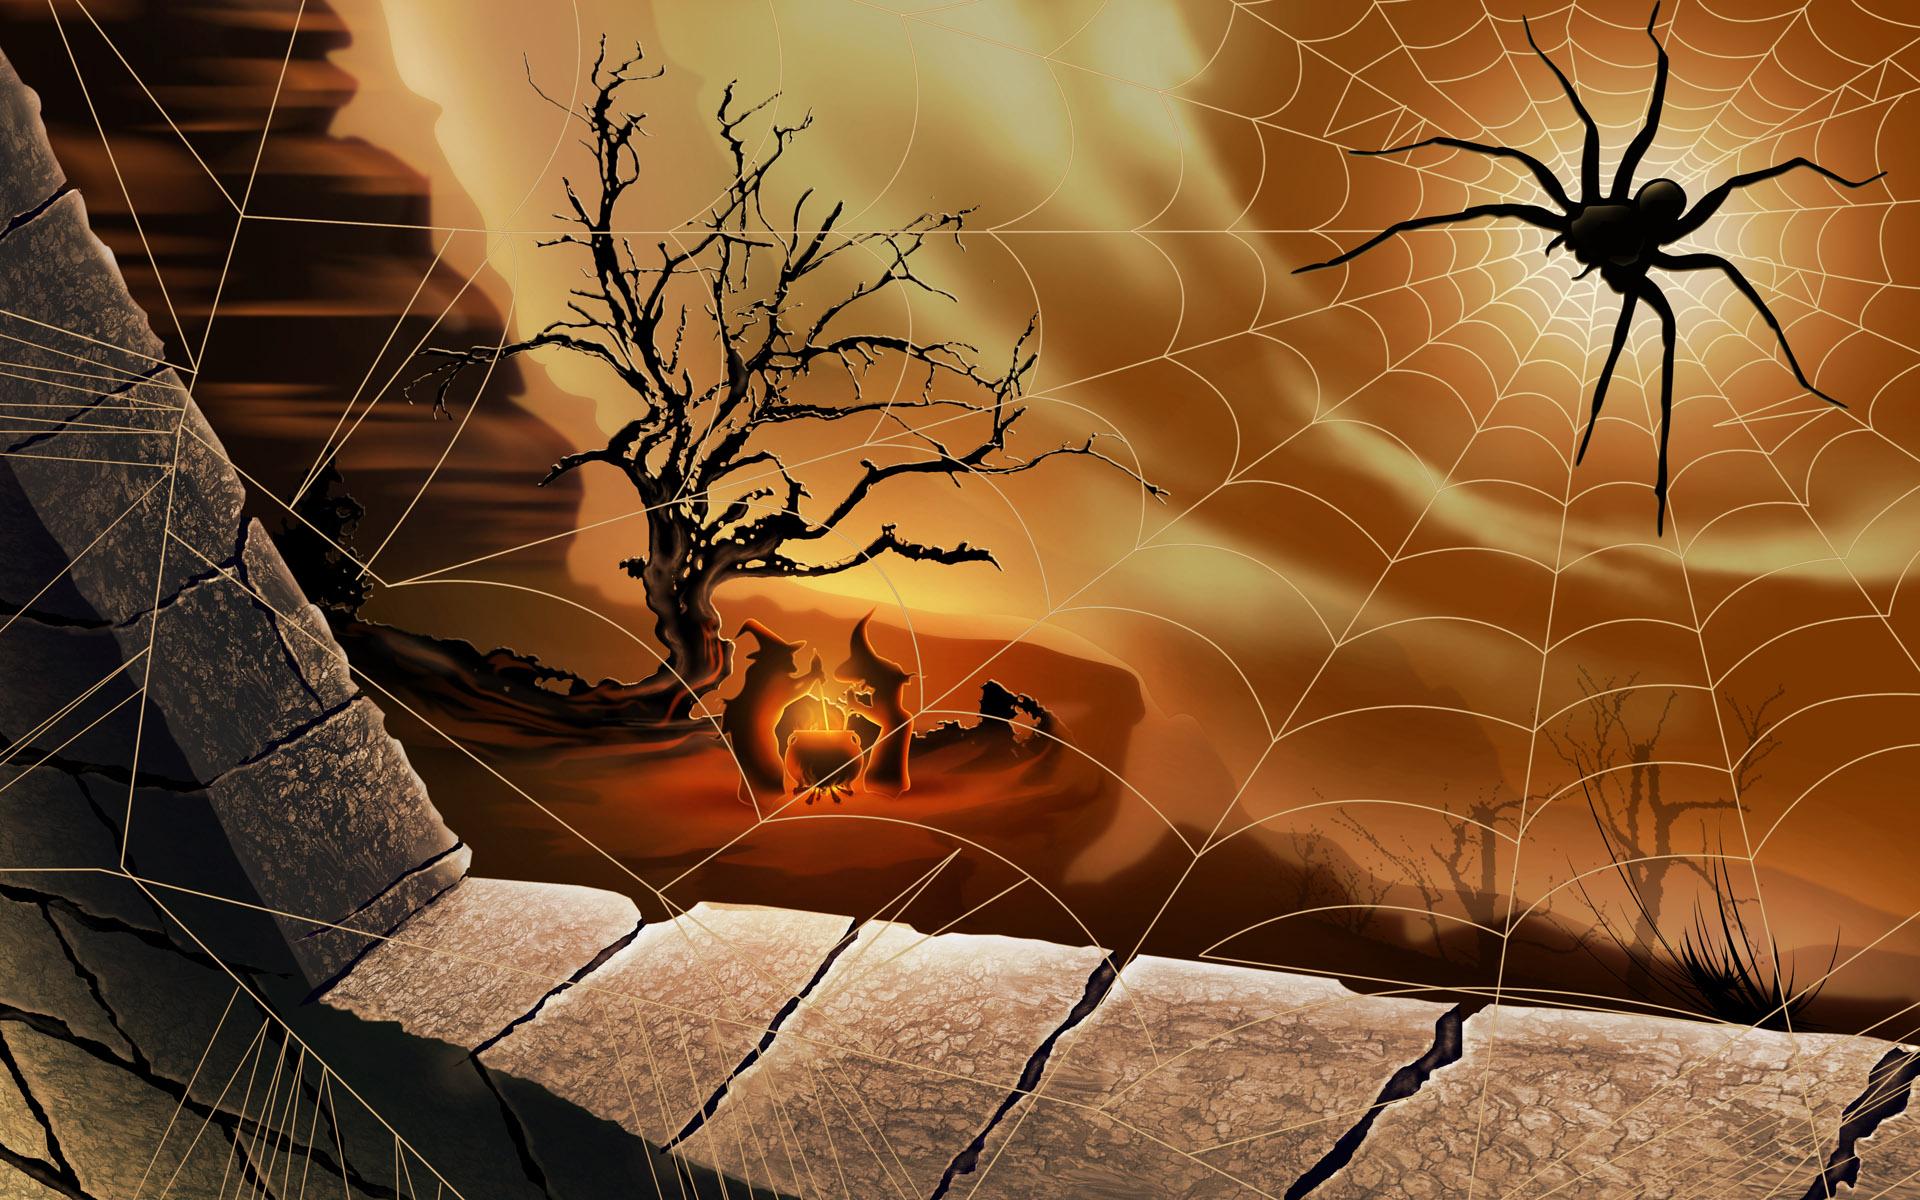 Spider Desktop Wallpapers FREE on Latorocom 1920x1200